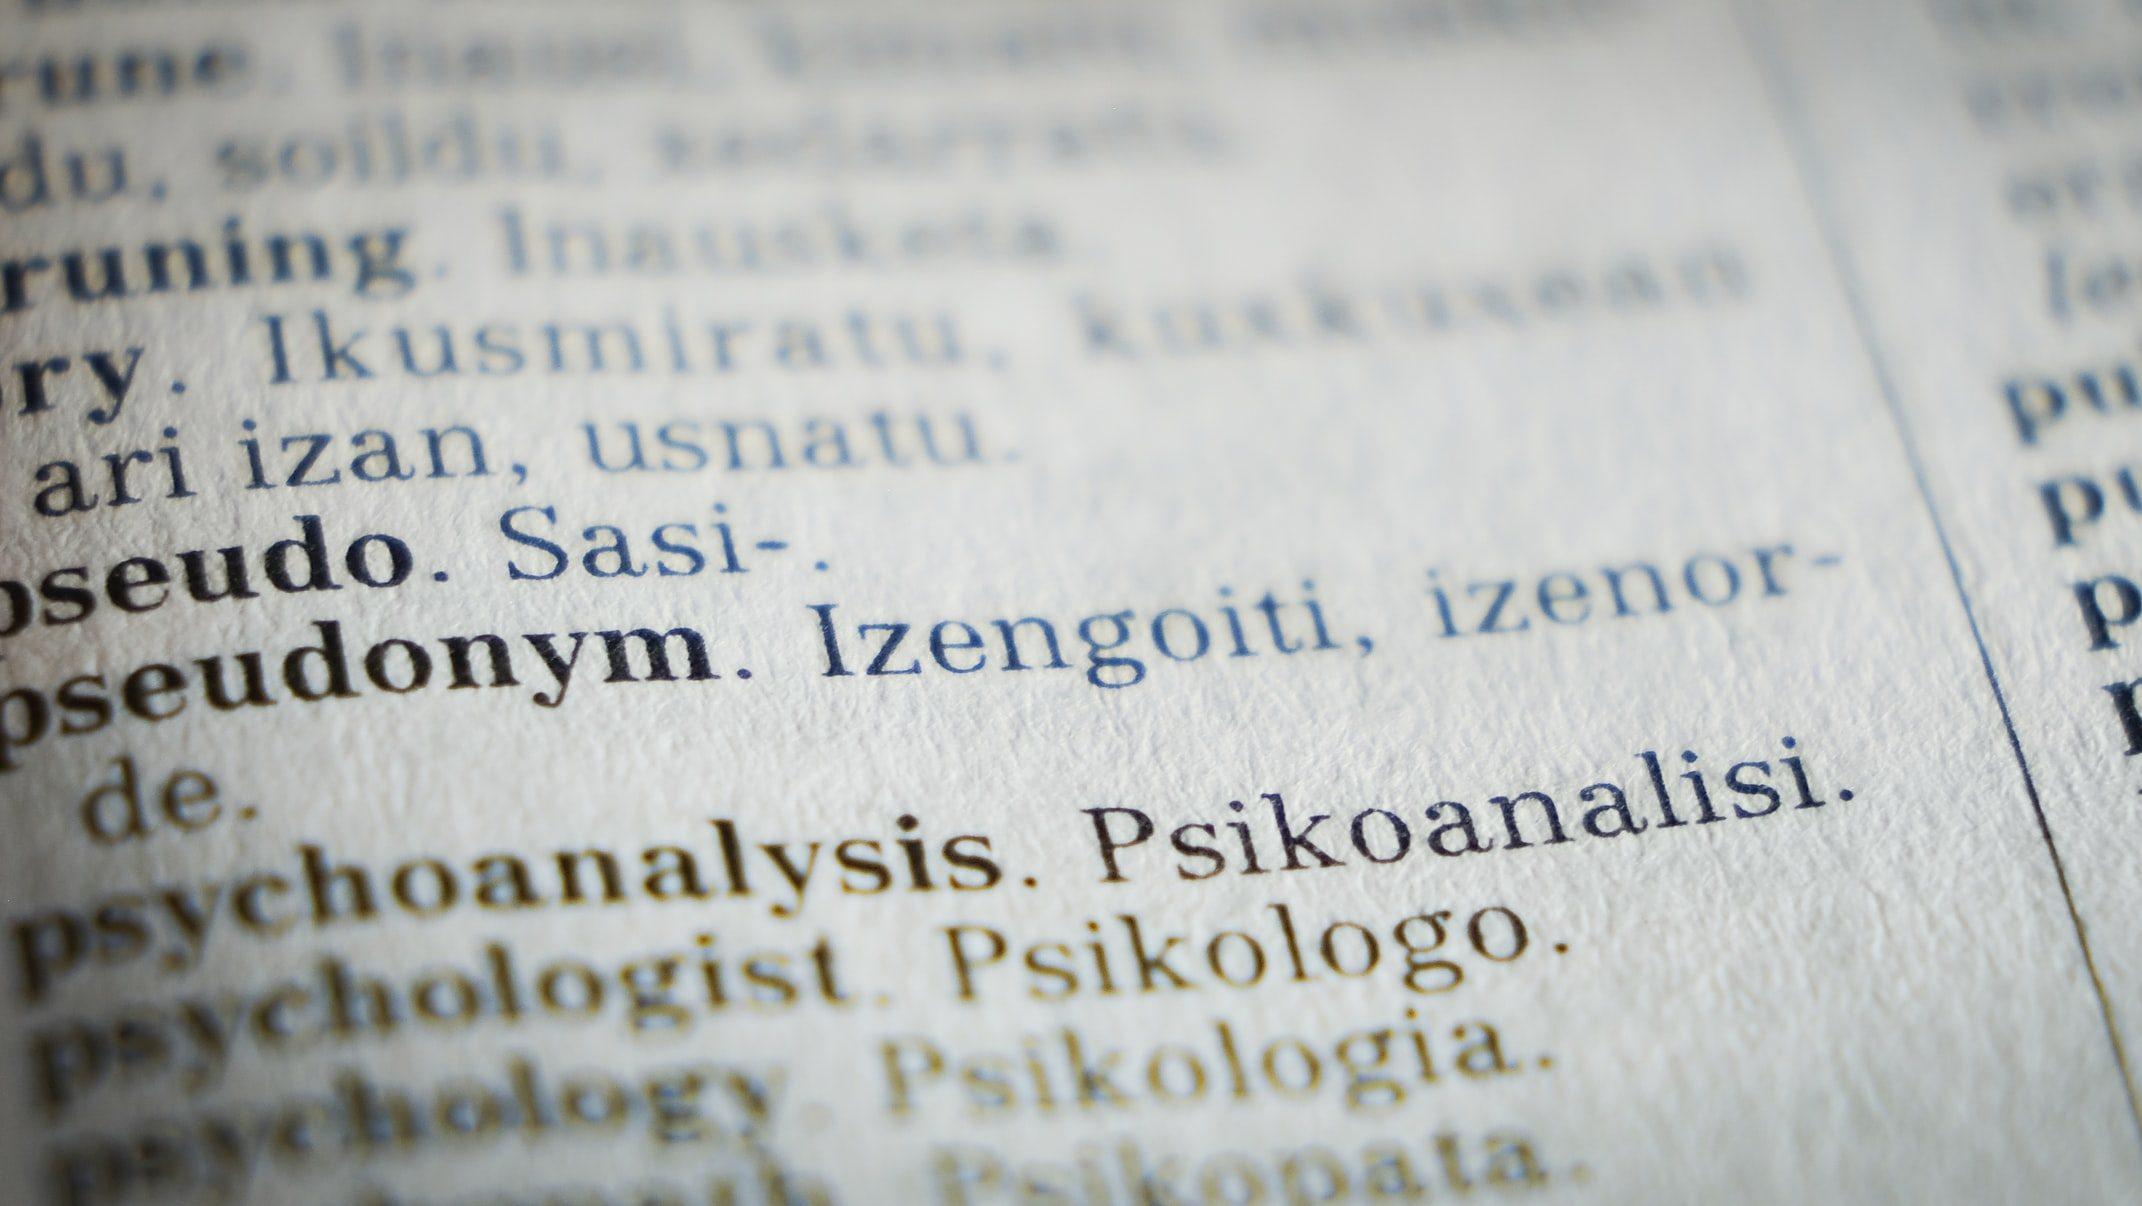 An English-Basque dictionary